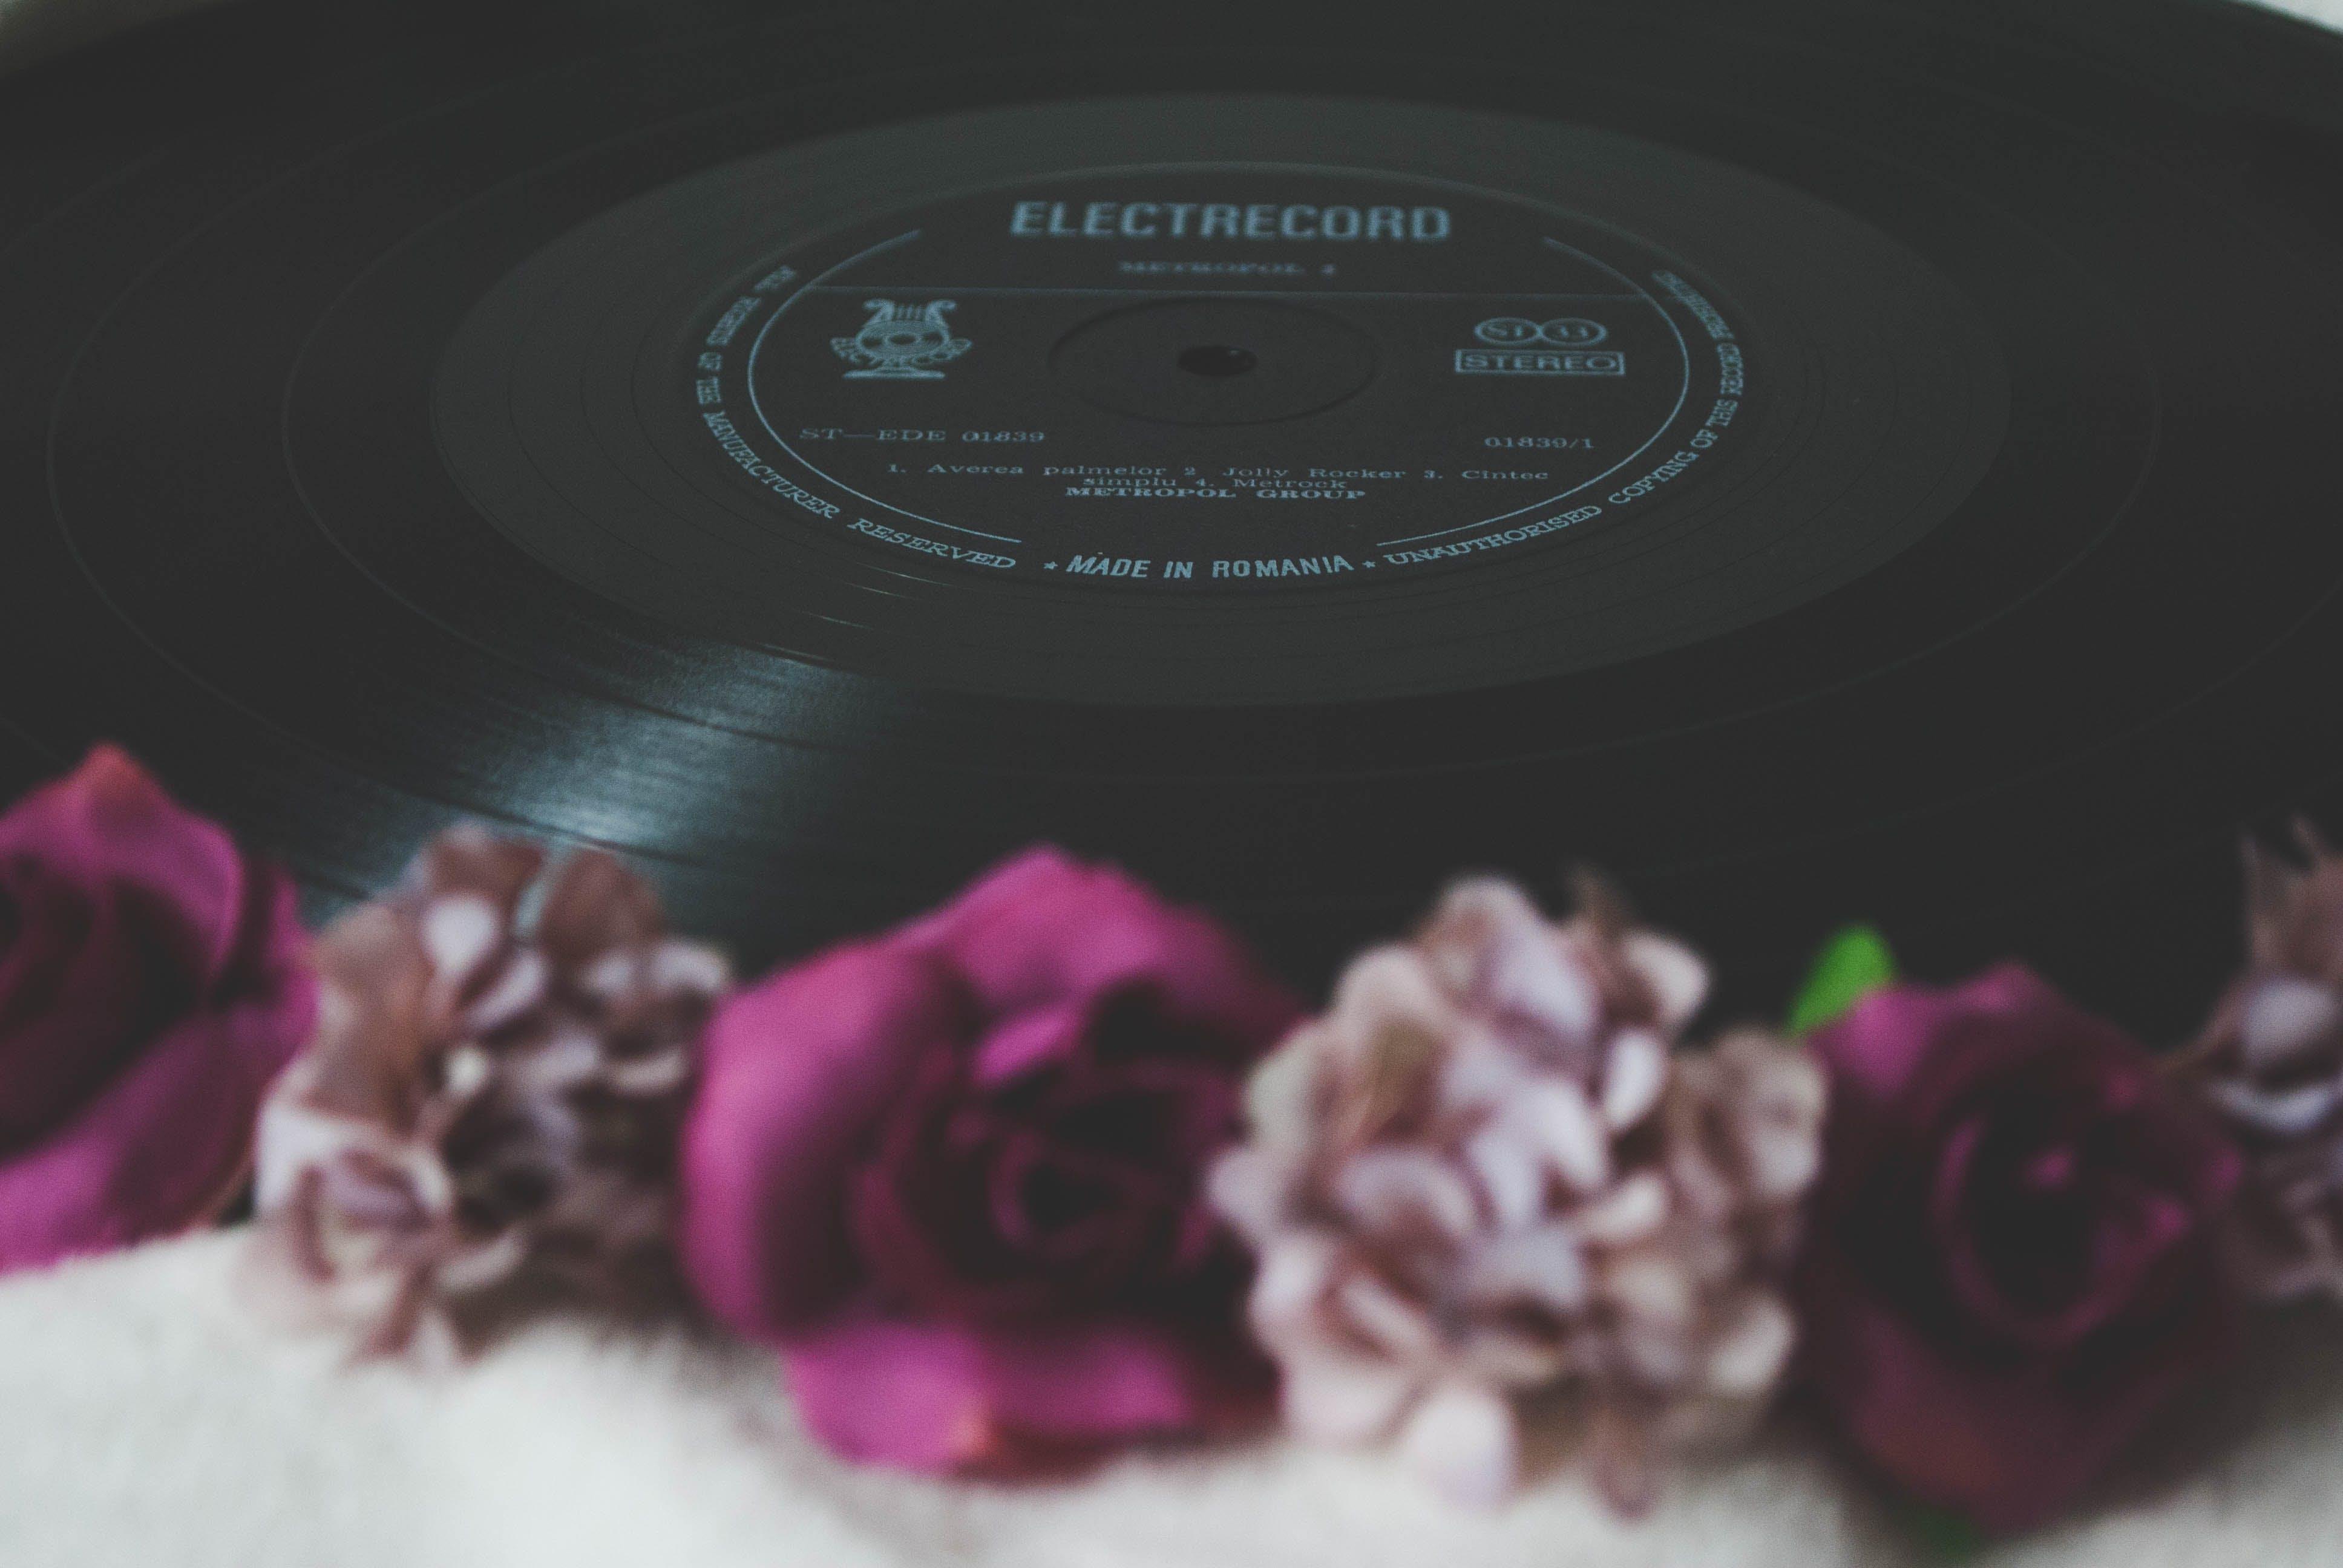 Floral Electrocord Vinyl Record Decor